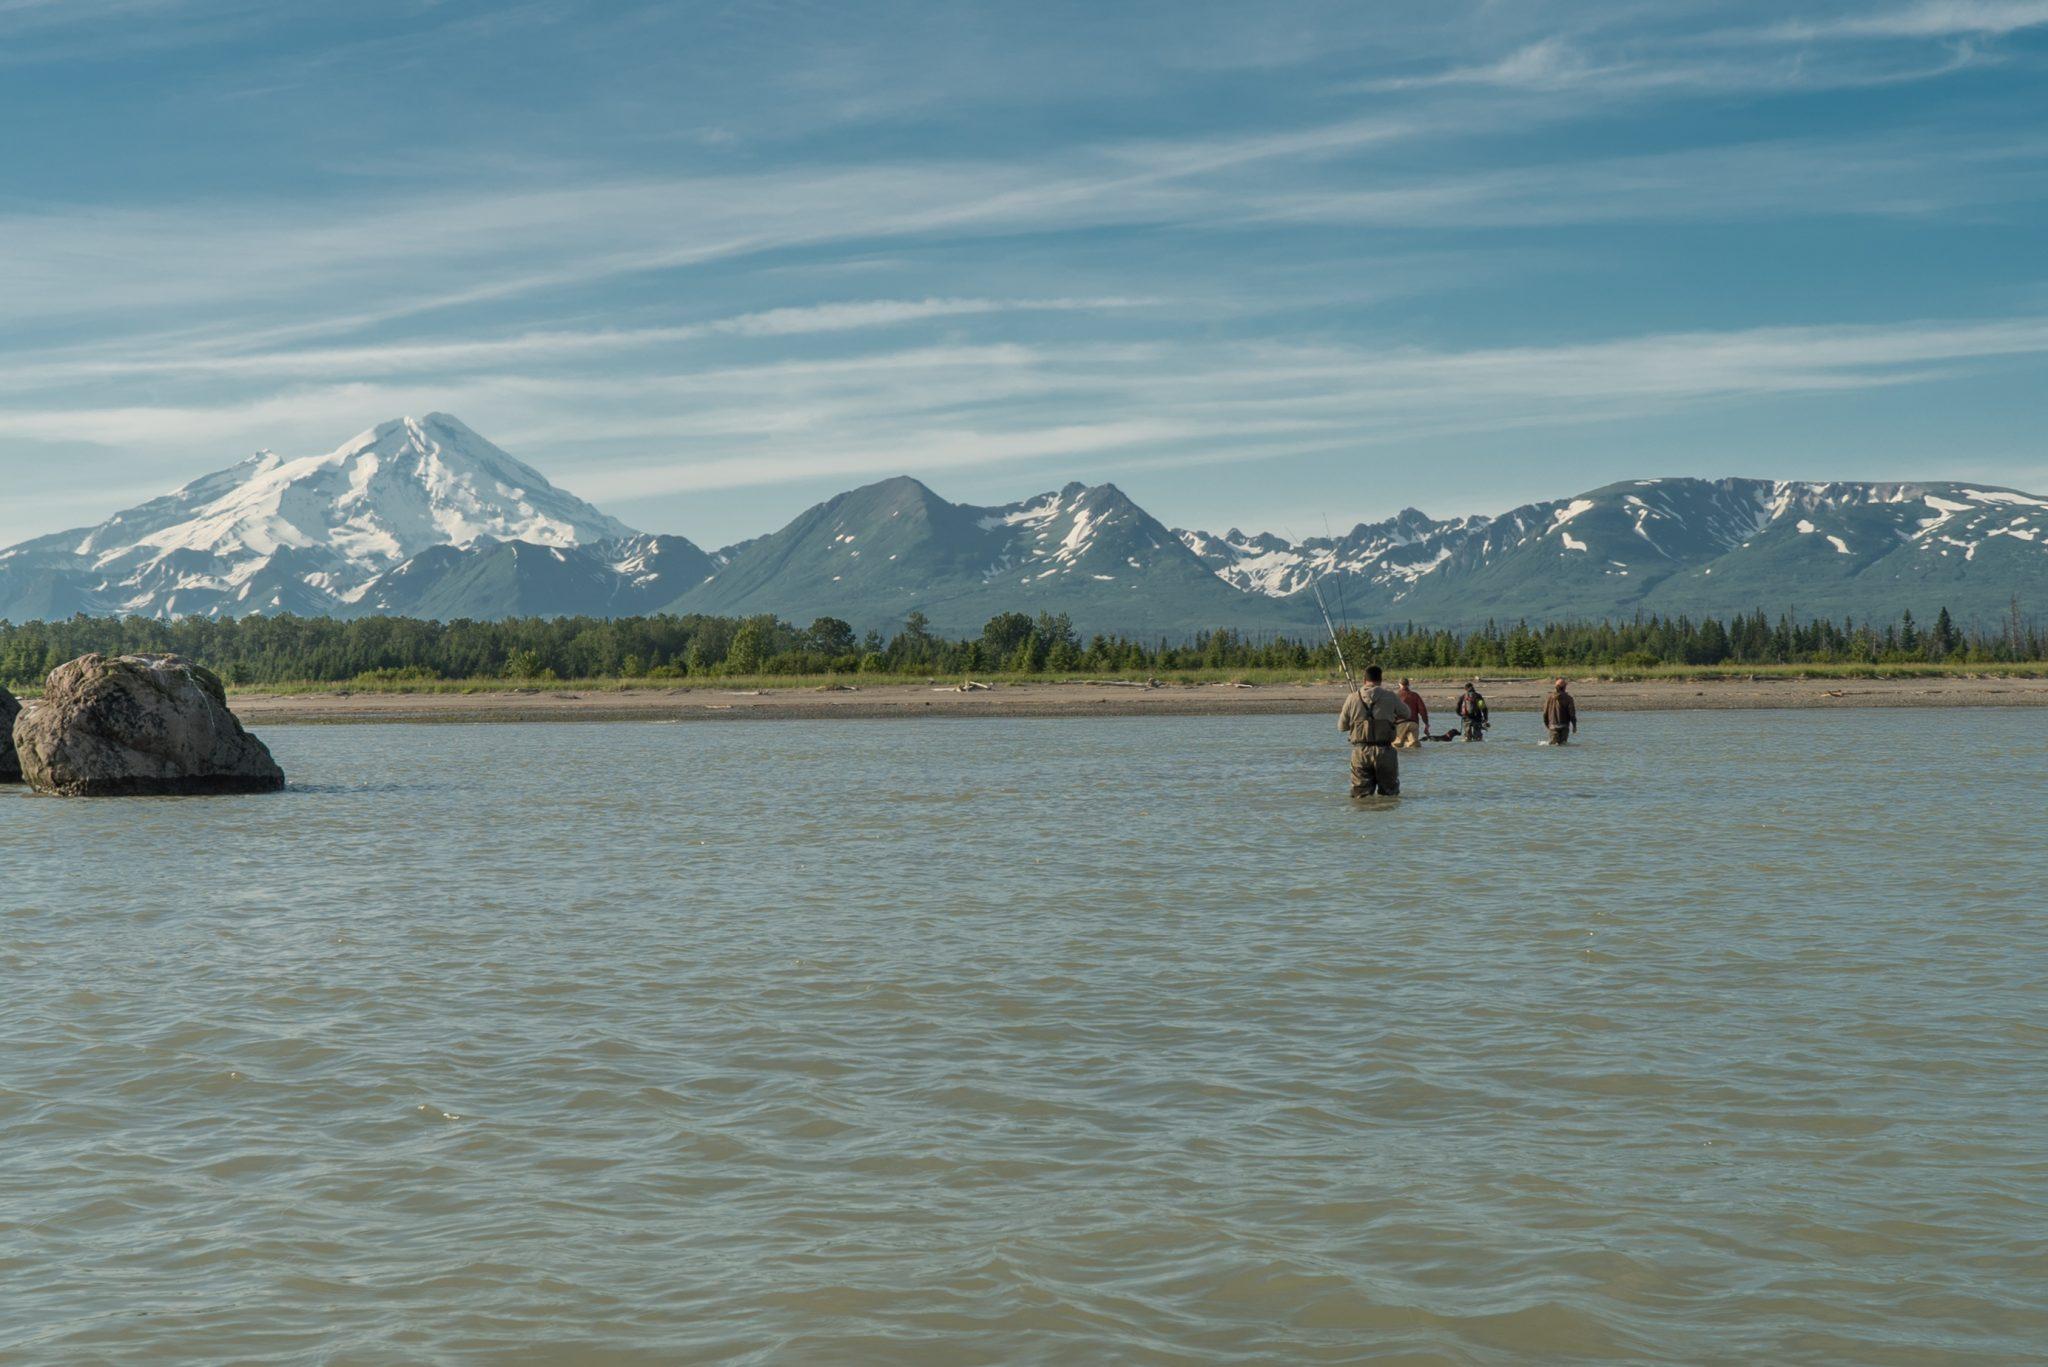 alaska-fishing-vacation-mountain-salmon-snug-harbor-DSC06844